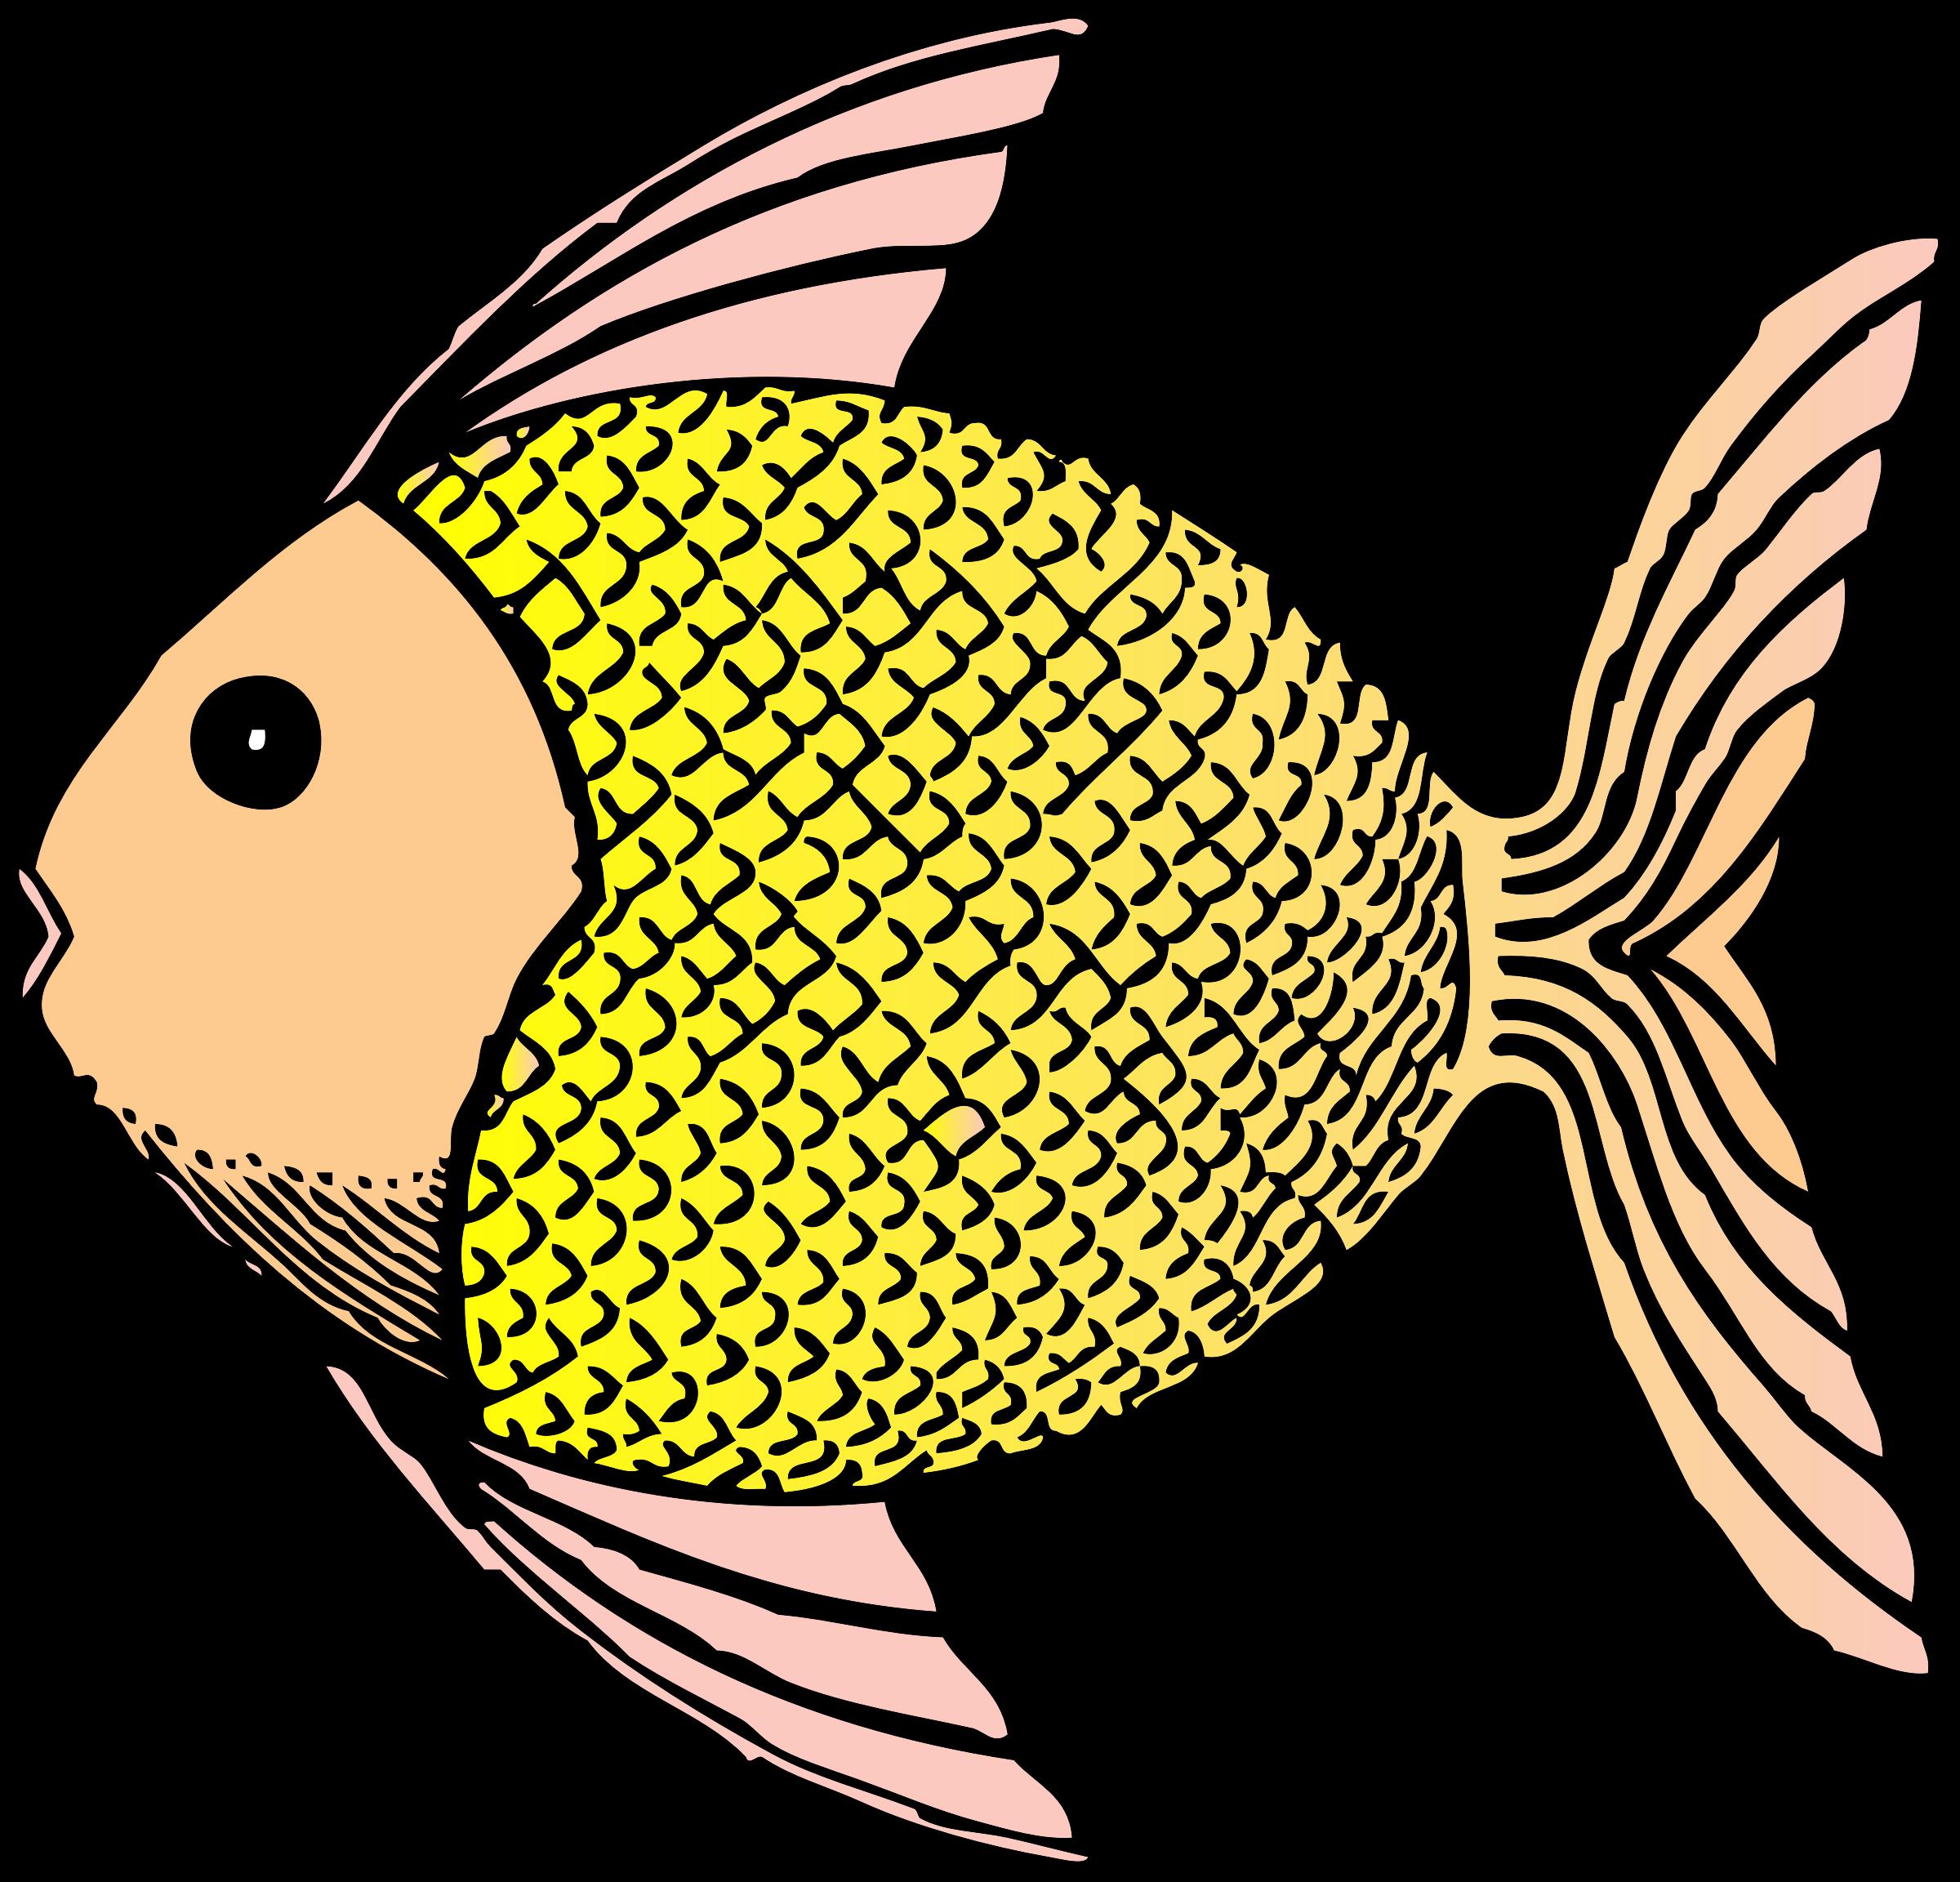 Clipart ocean tropical. Fish big image png